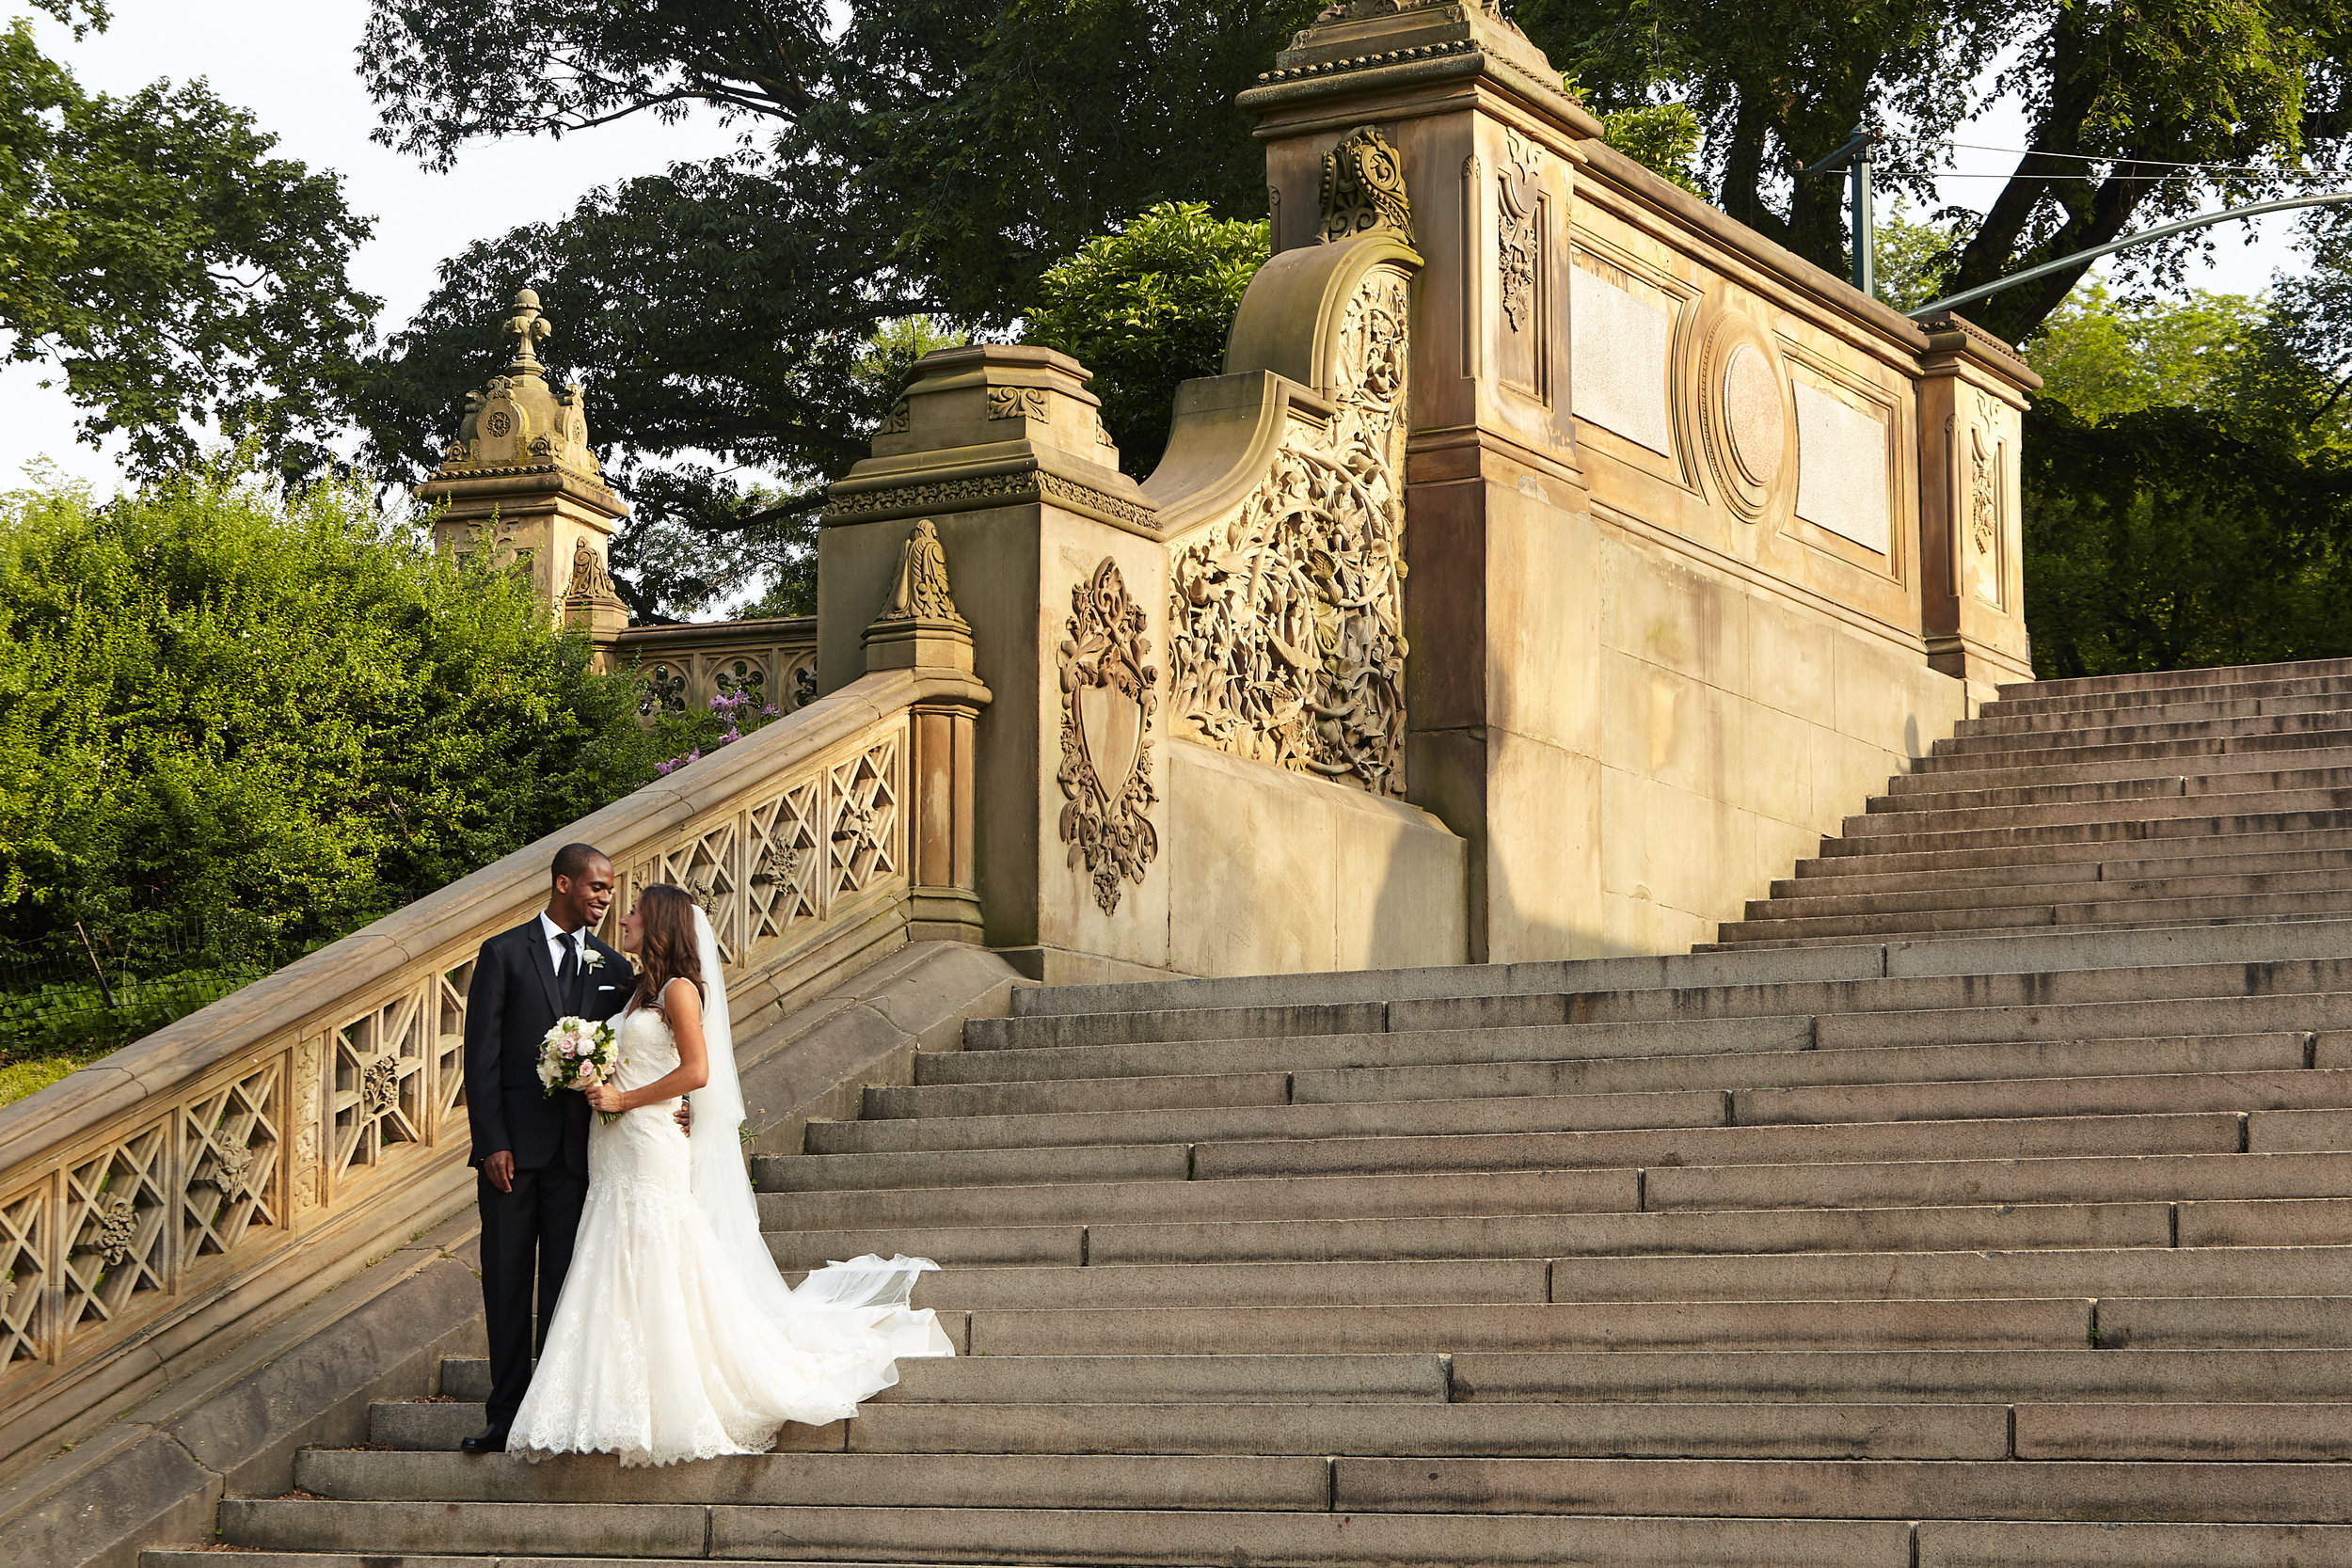 180601_AnnaAdom_CP_Wedding_ 643.jpg